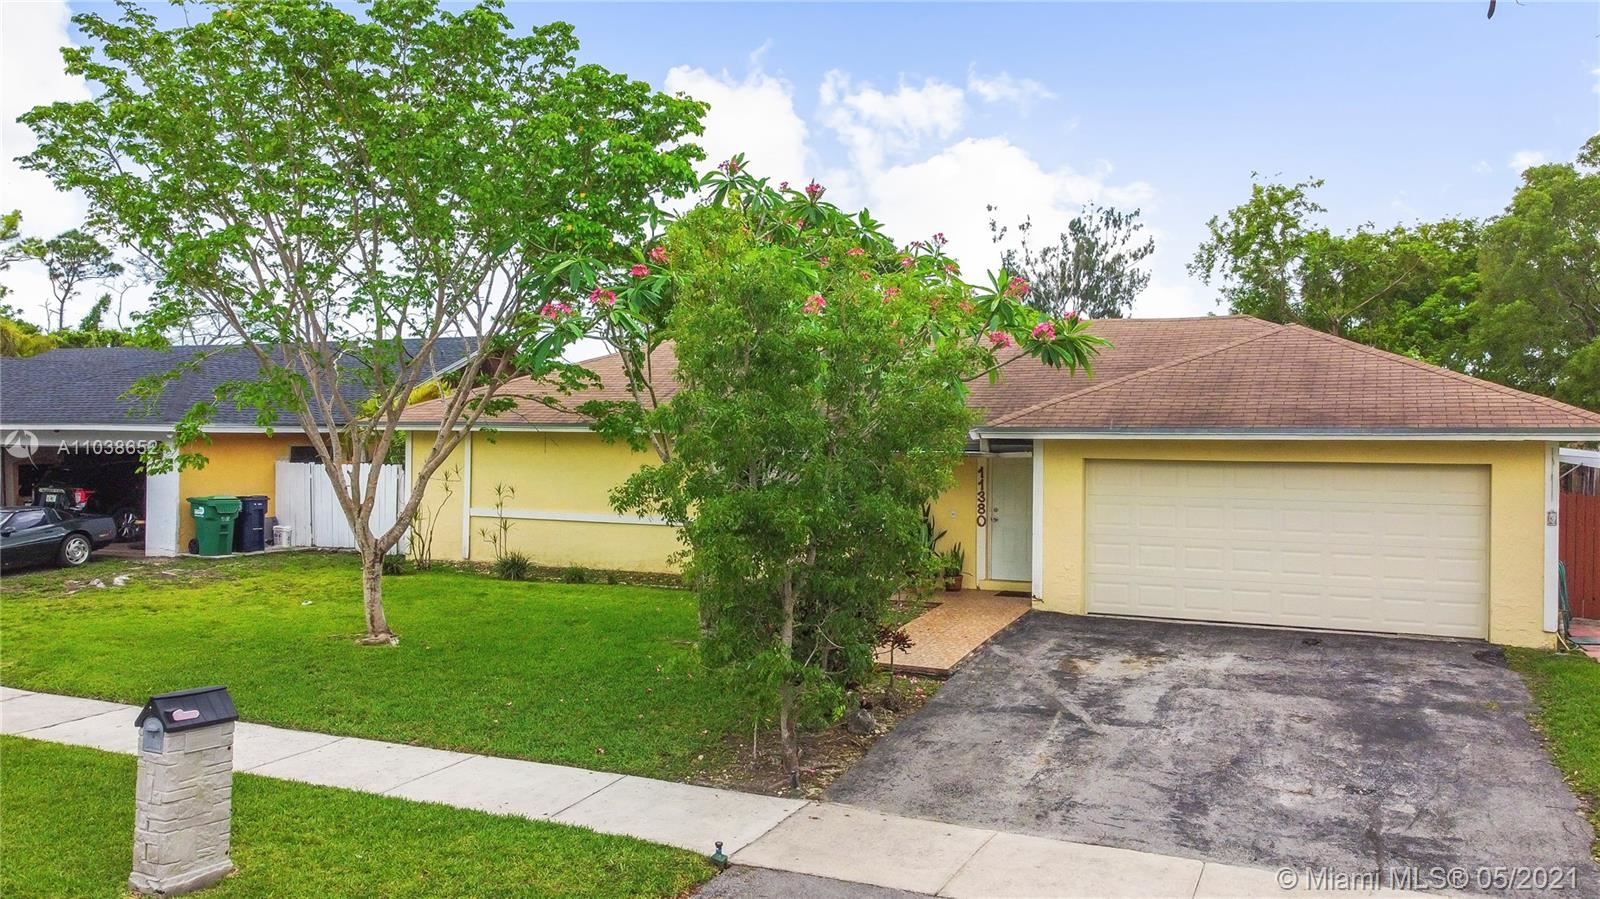 Photo of 11380 SW 118th St, Miami, FL 33176 (MLS # A11038652)